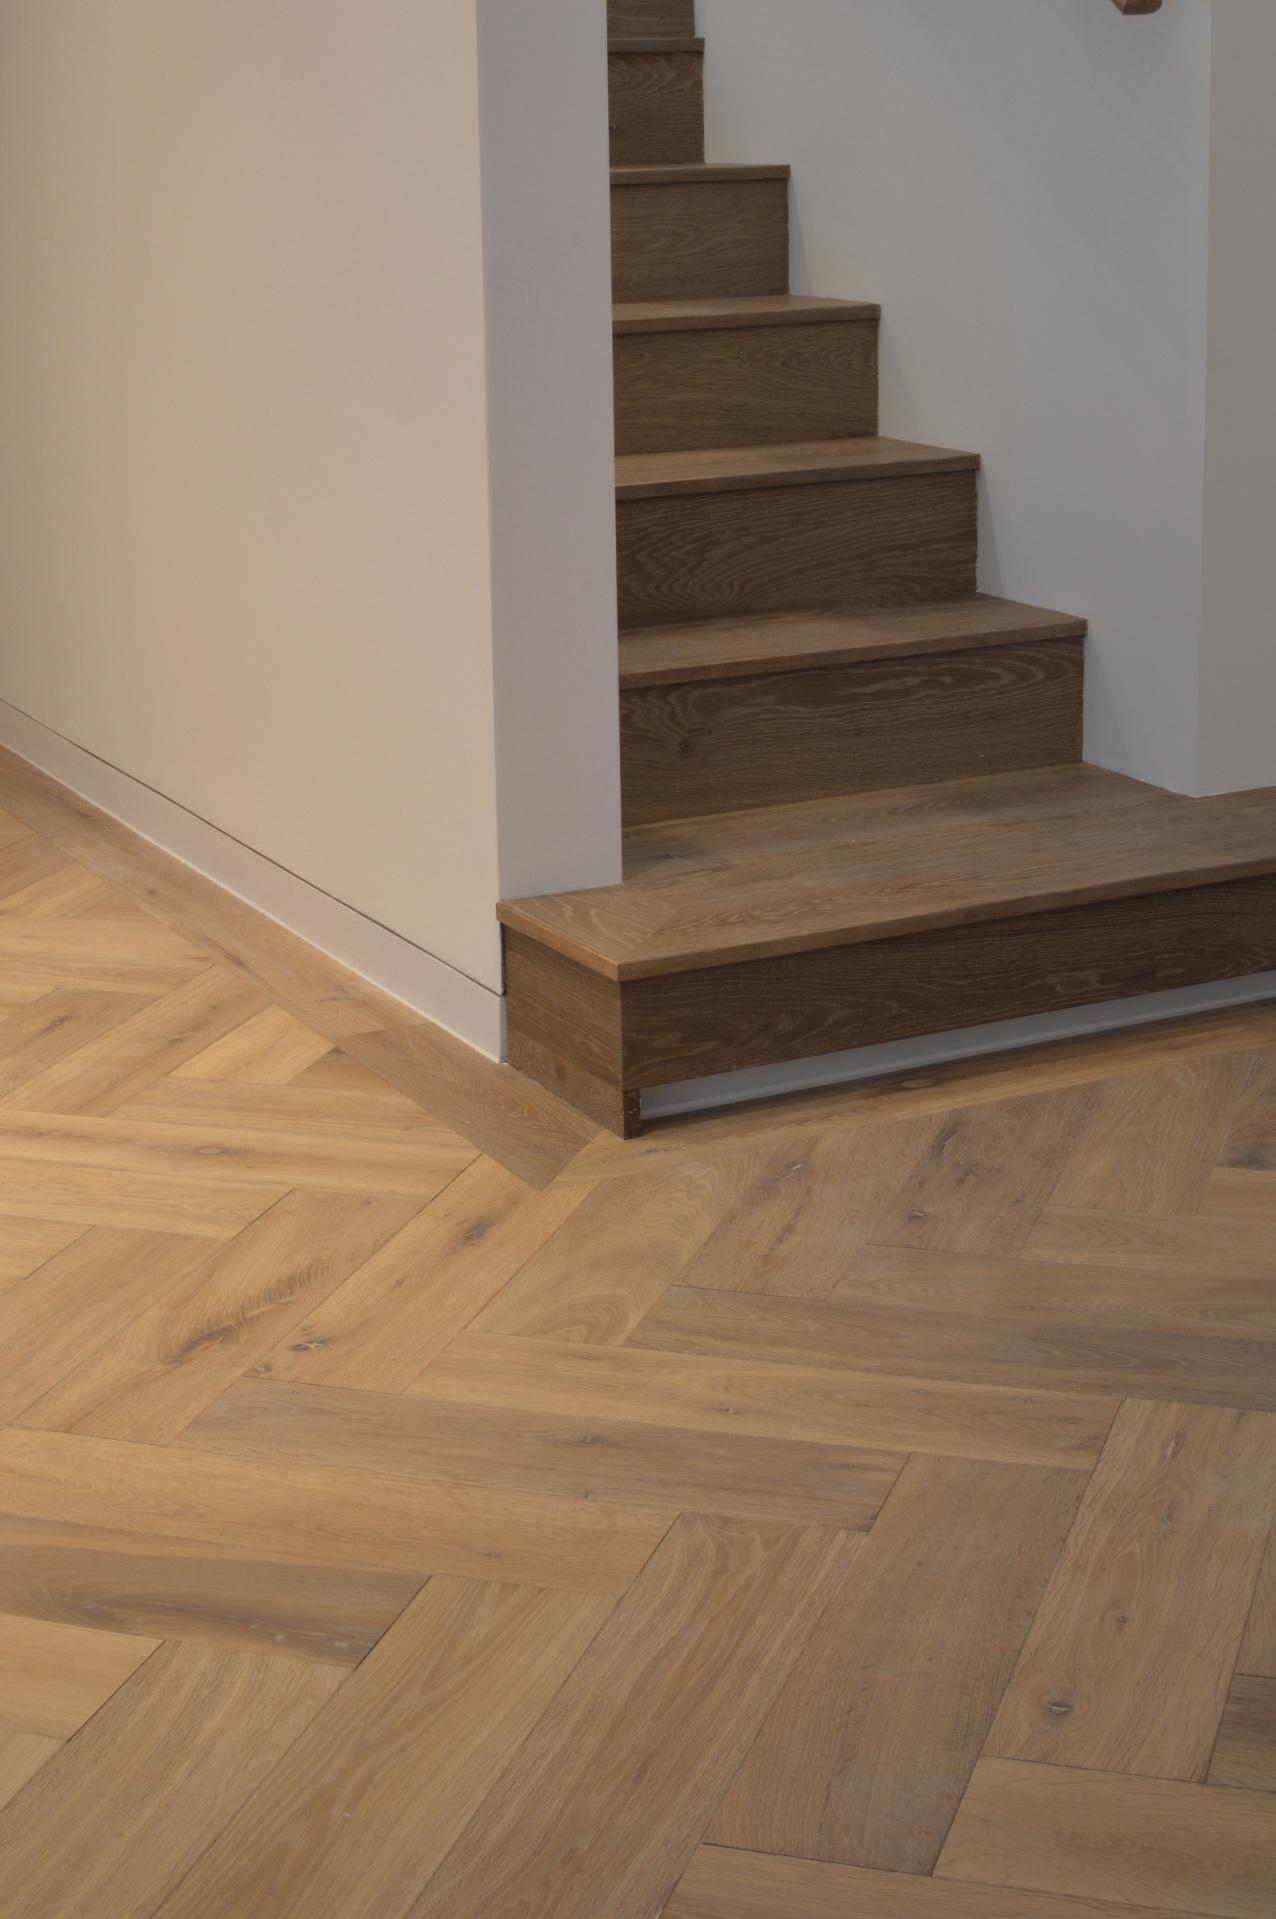 Oak landmark dyrham herringbone with enclosed staircase and floor light